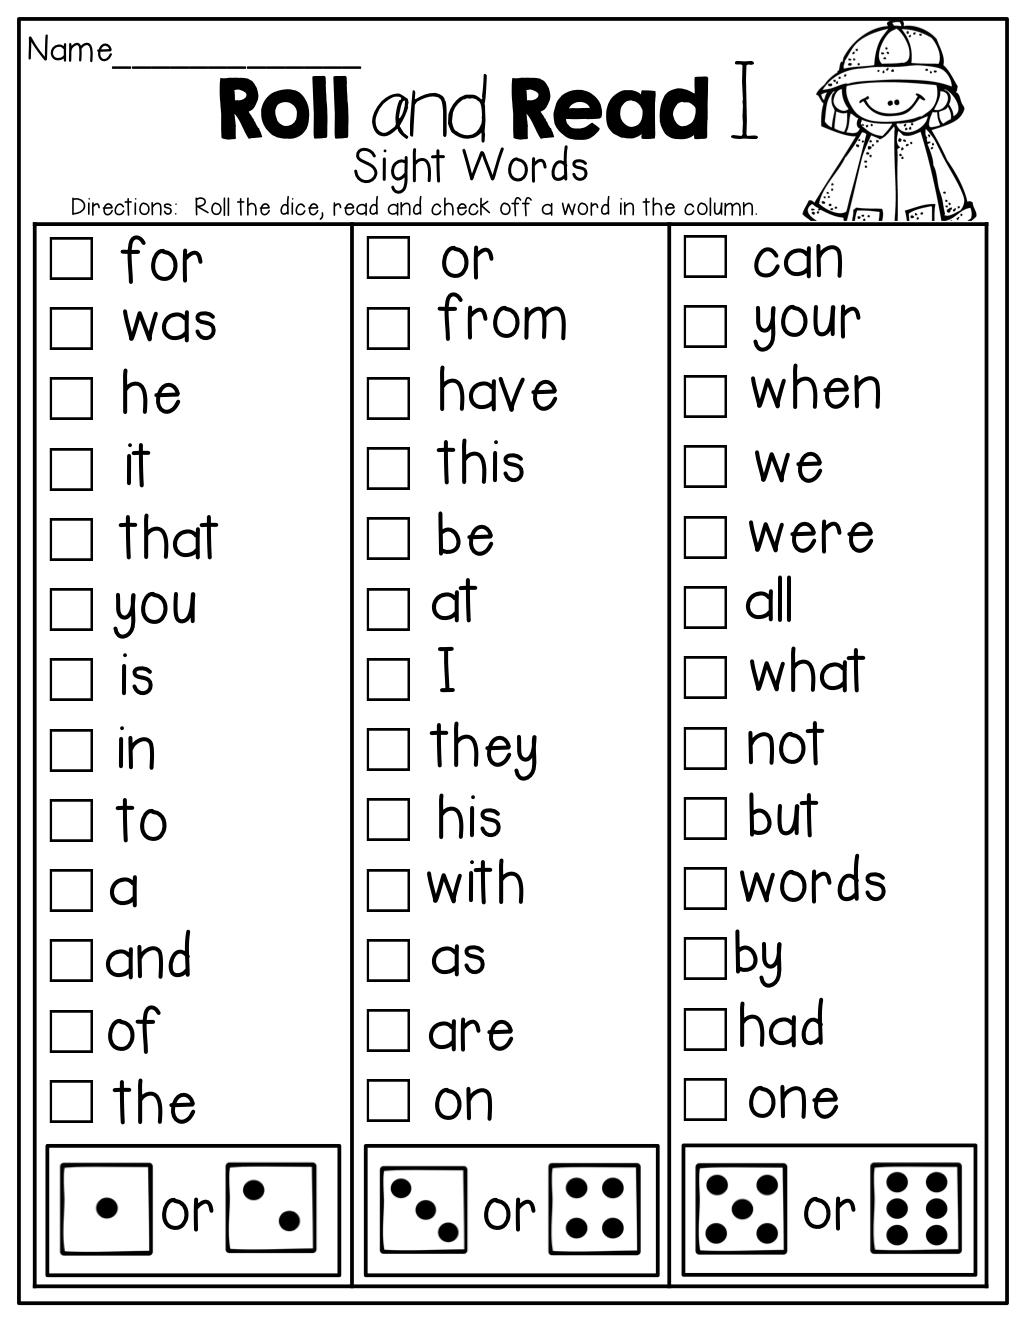 The Moffatt Girls Spring Math And Literacy Packet Kindergarten Sight Words Kindergarten Teaching Sight Words Sight Word Worksheets [ 1325 x 1024 Pixel ]